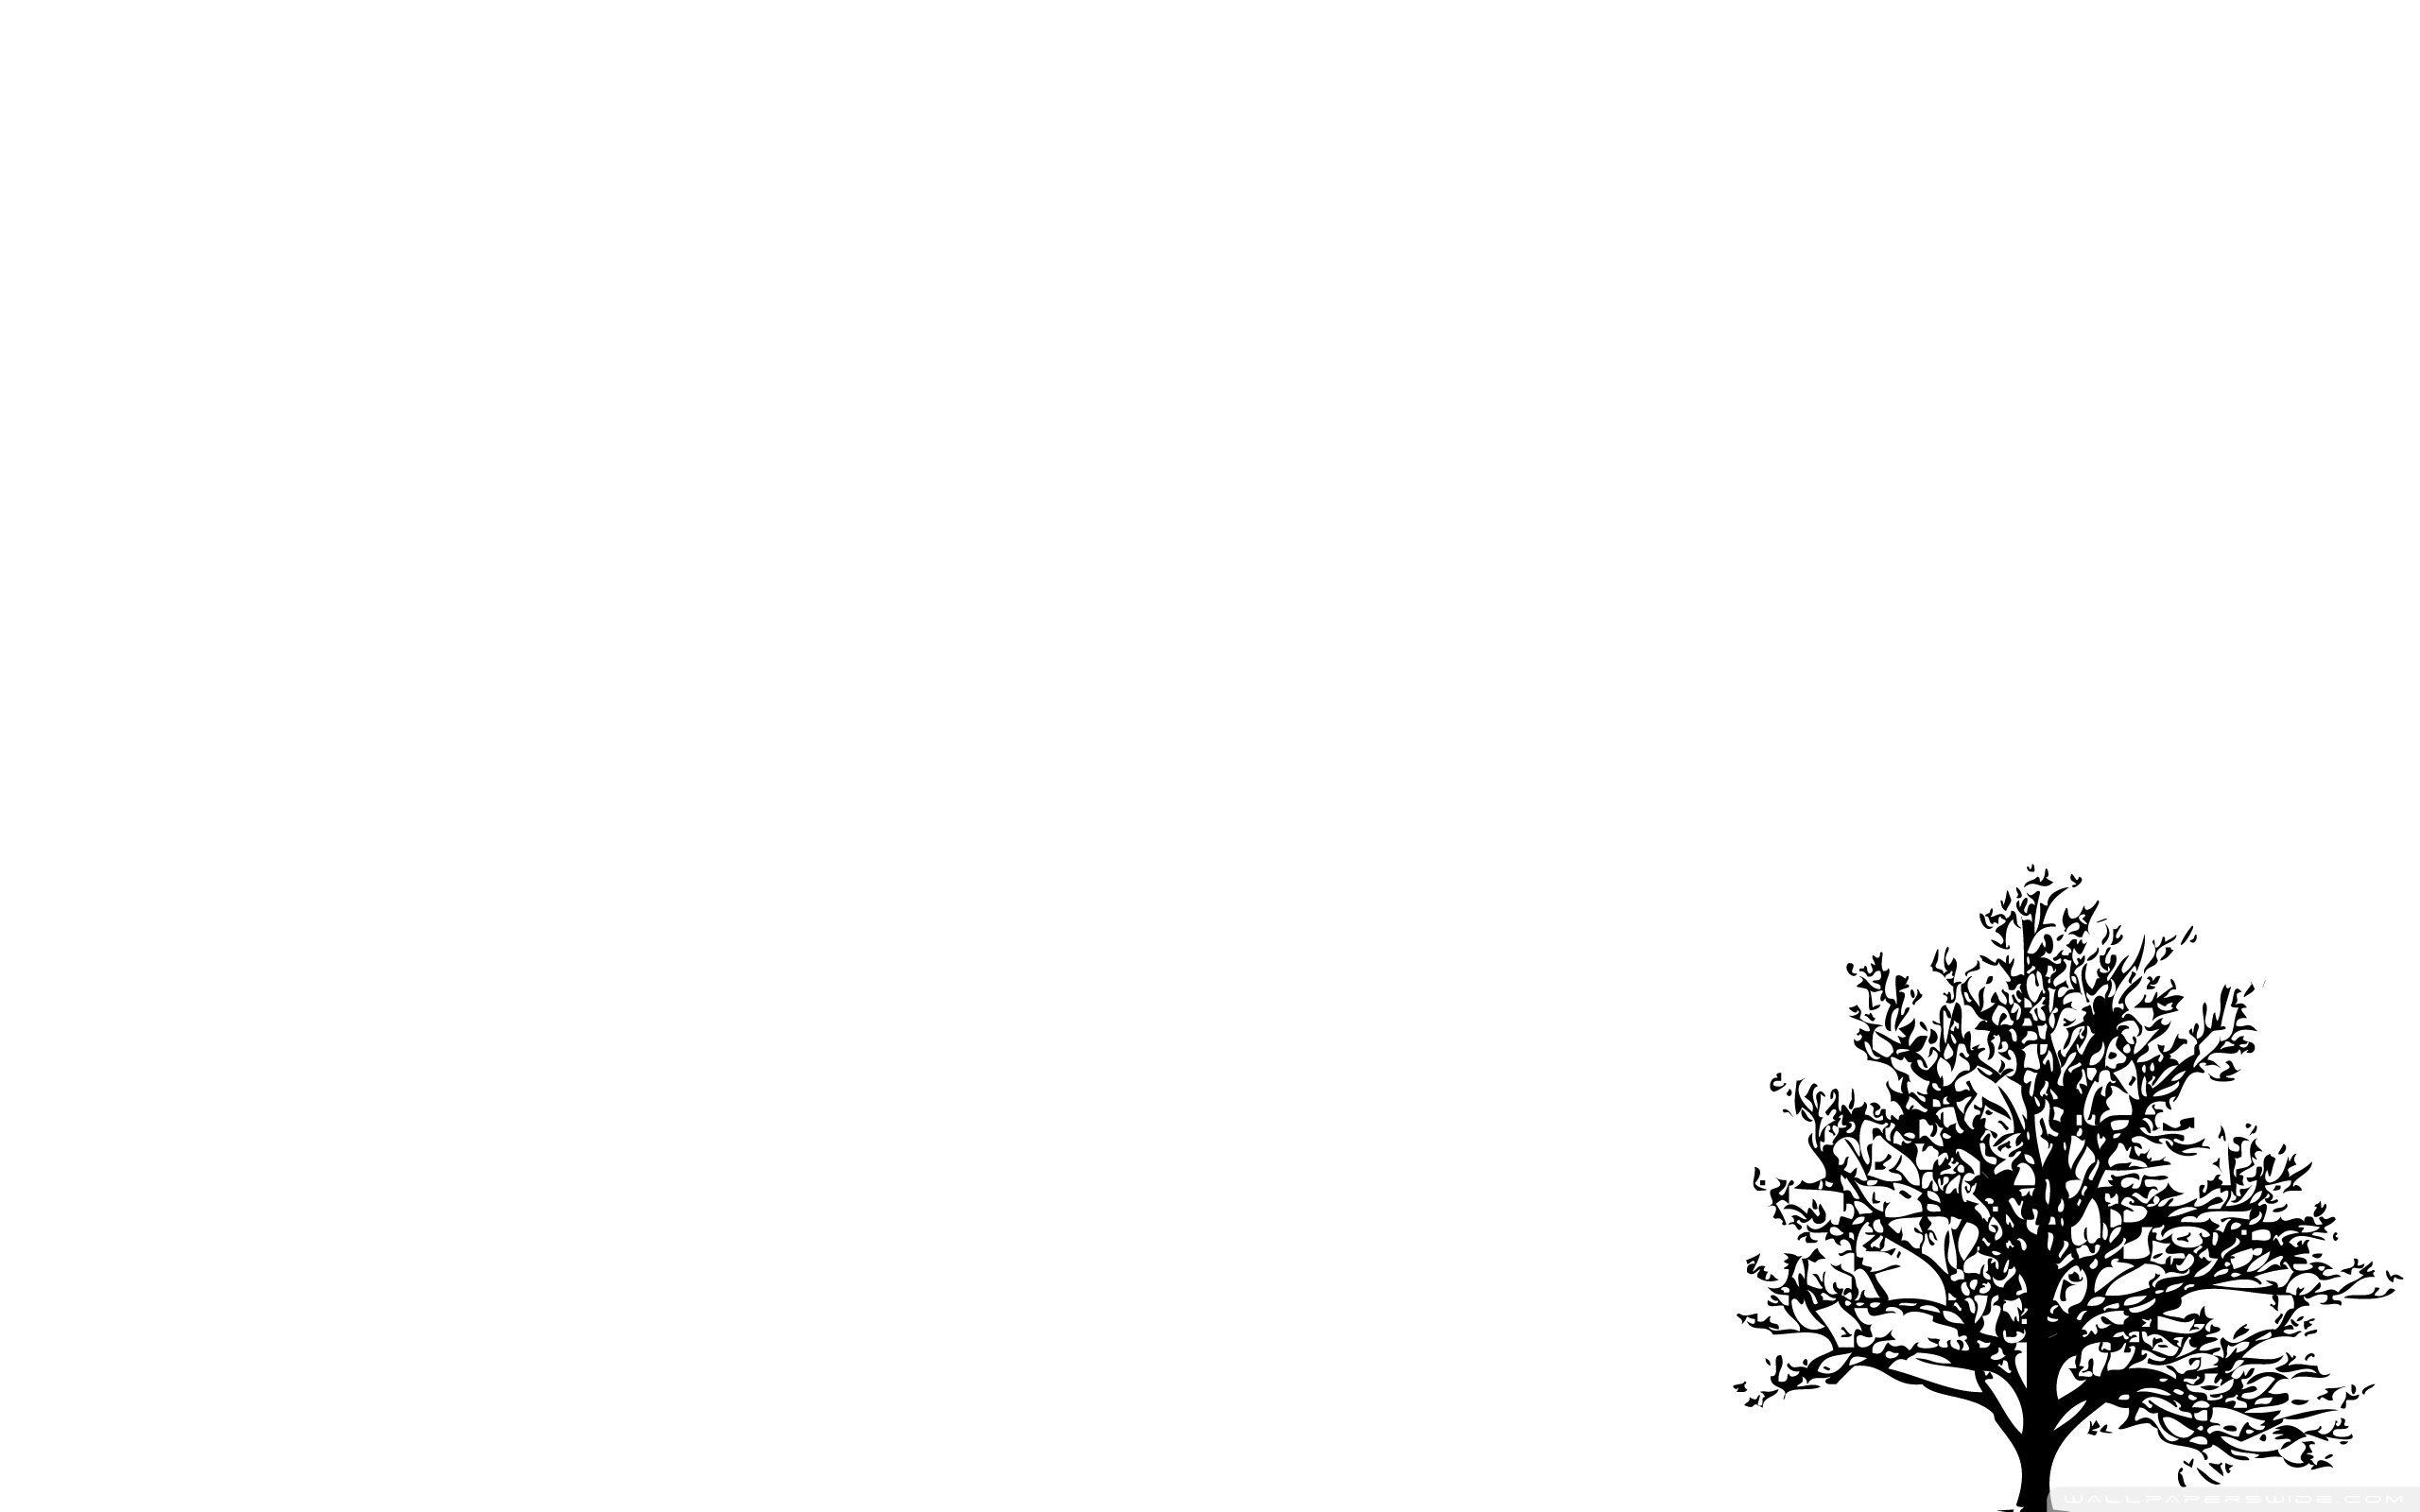 White Minimalist Wallpapers   Top White Minimalist 2560x1600